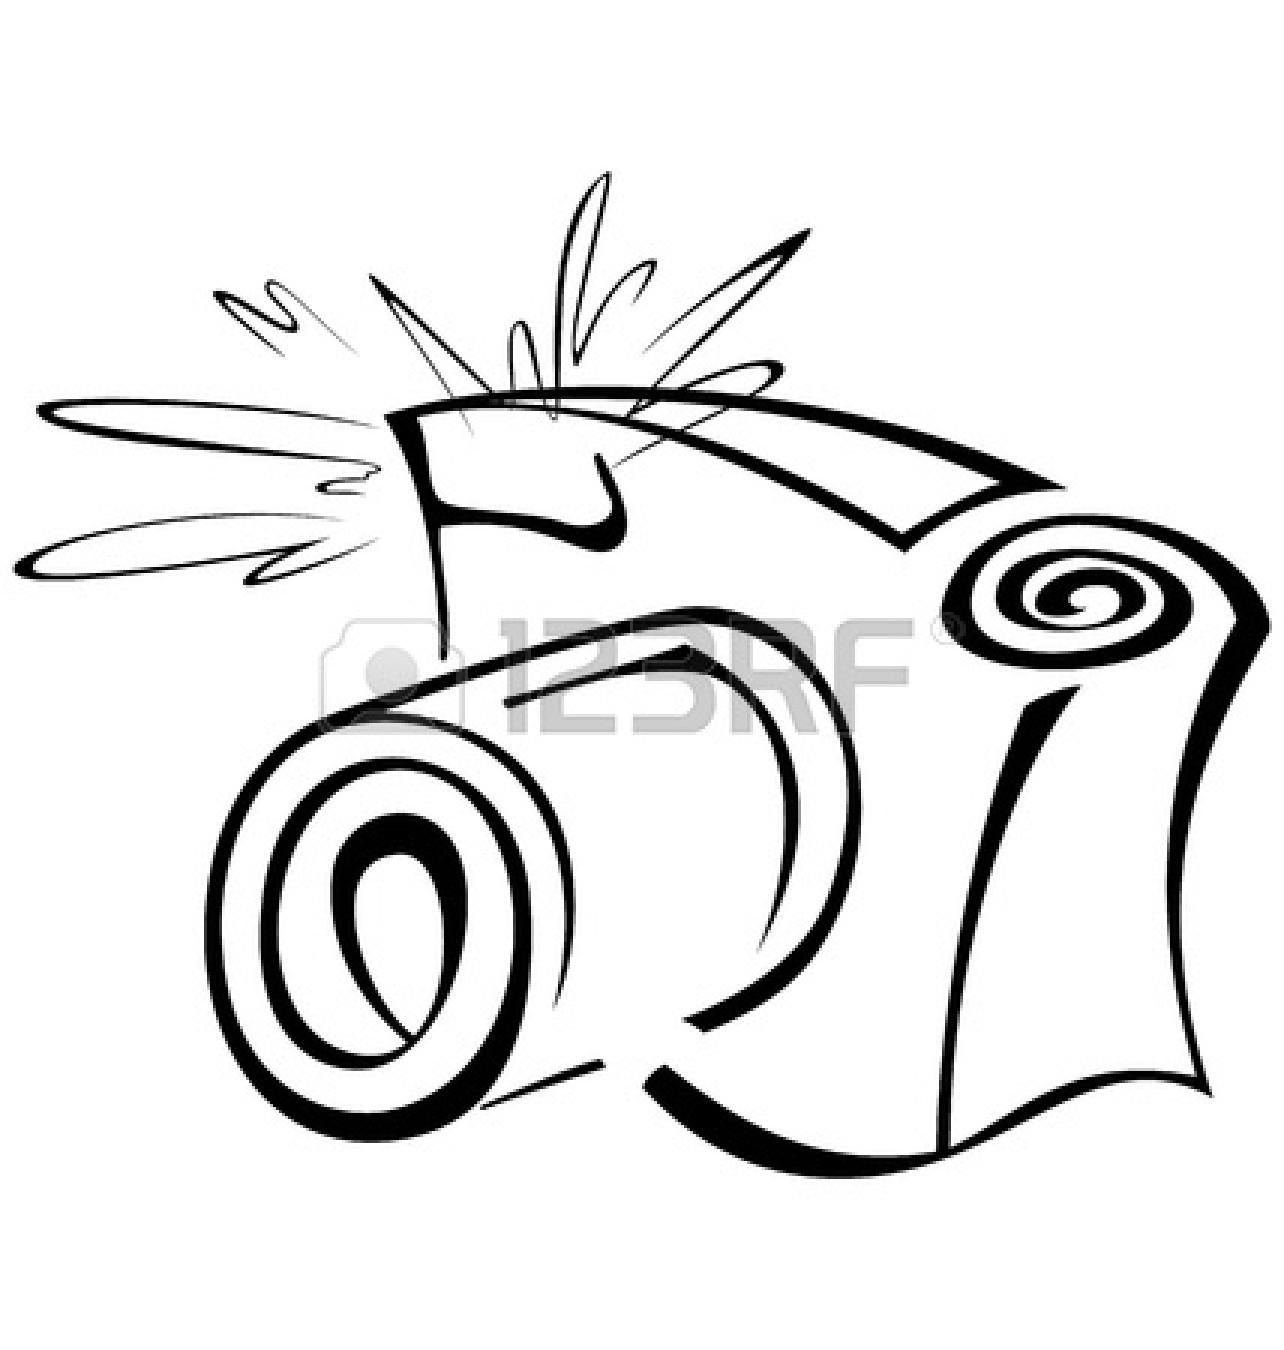 1284x1350 Drawn Camera Flash Clip Art